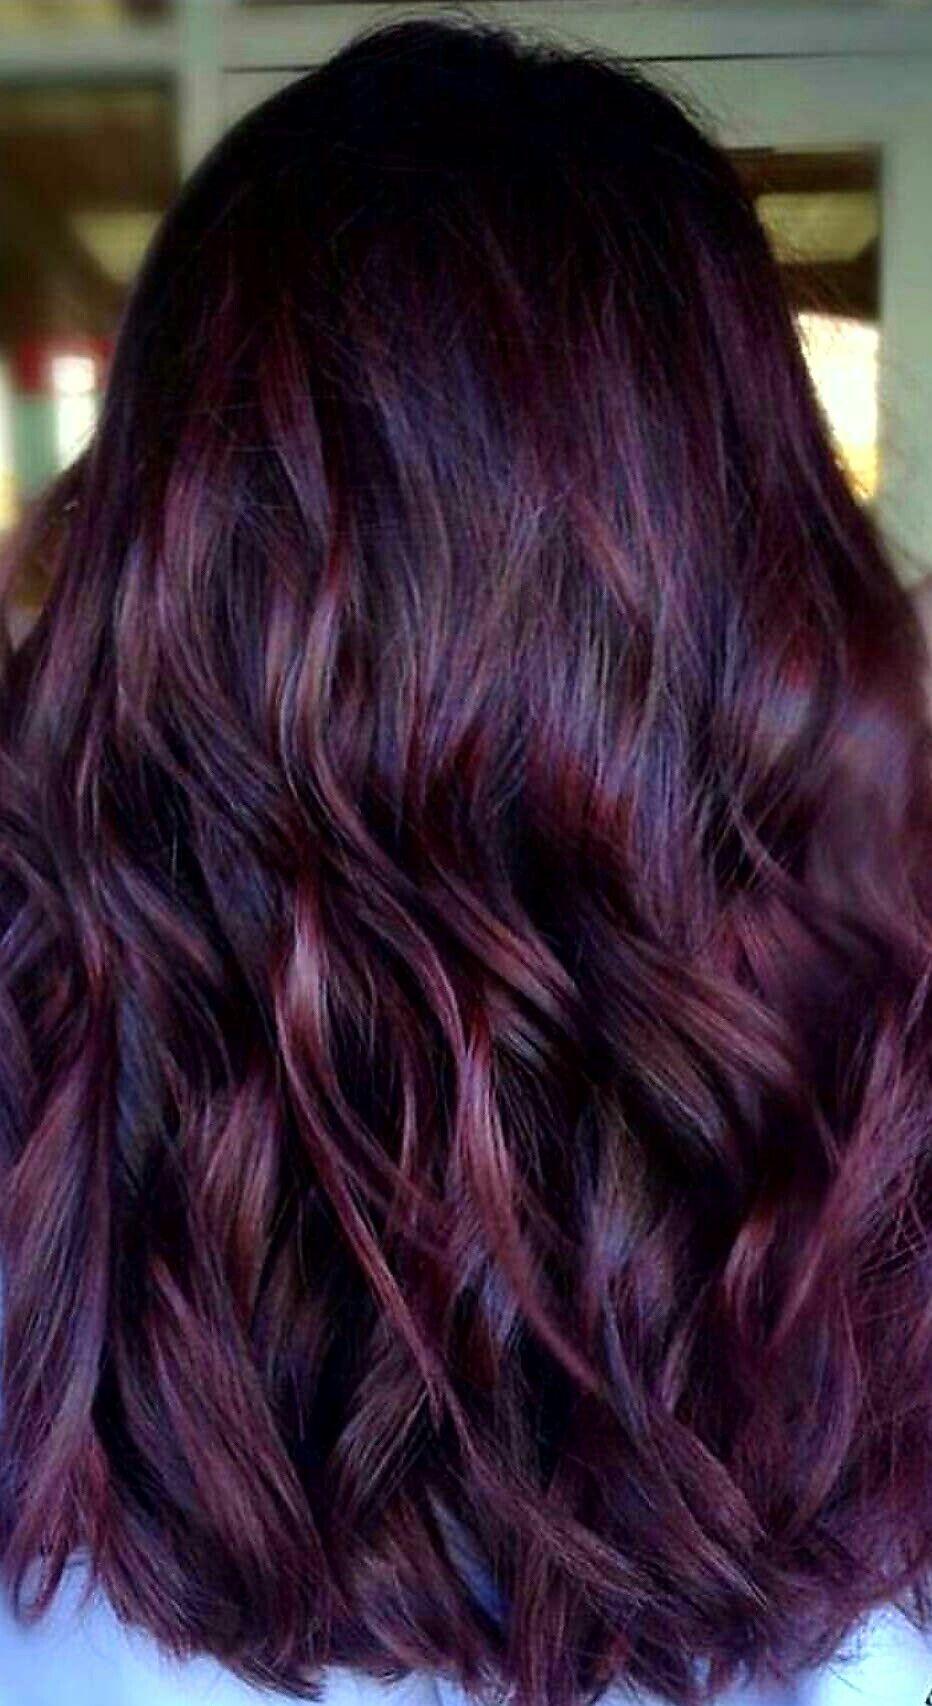 Themisfitblonde Love This Brunette Hair Color Hair Styles Burgundy Hair